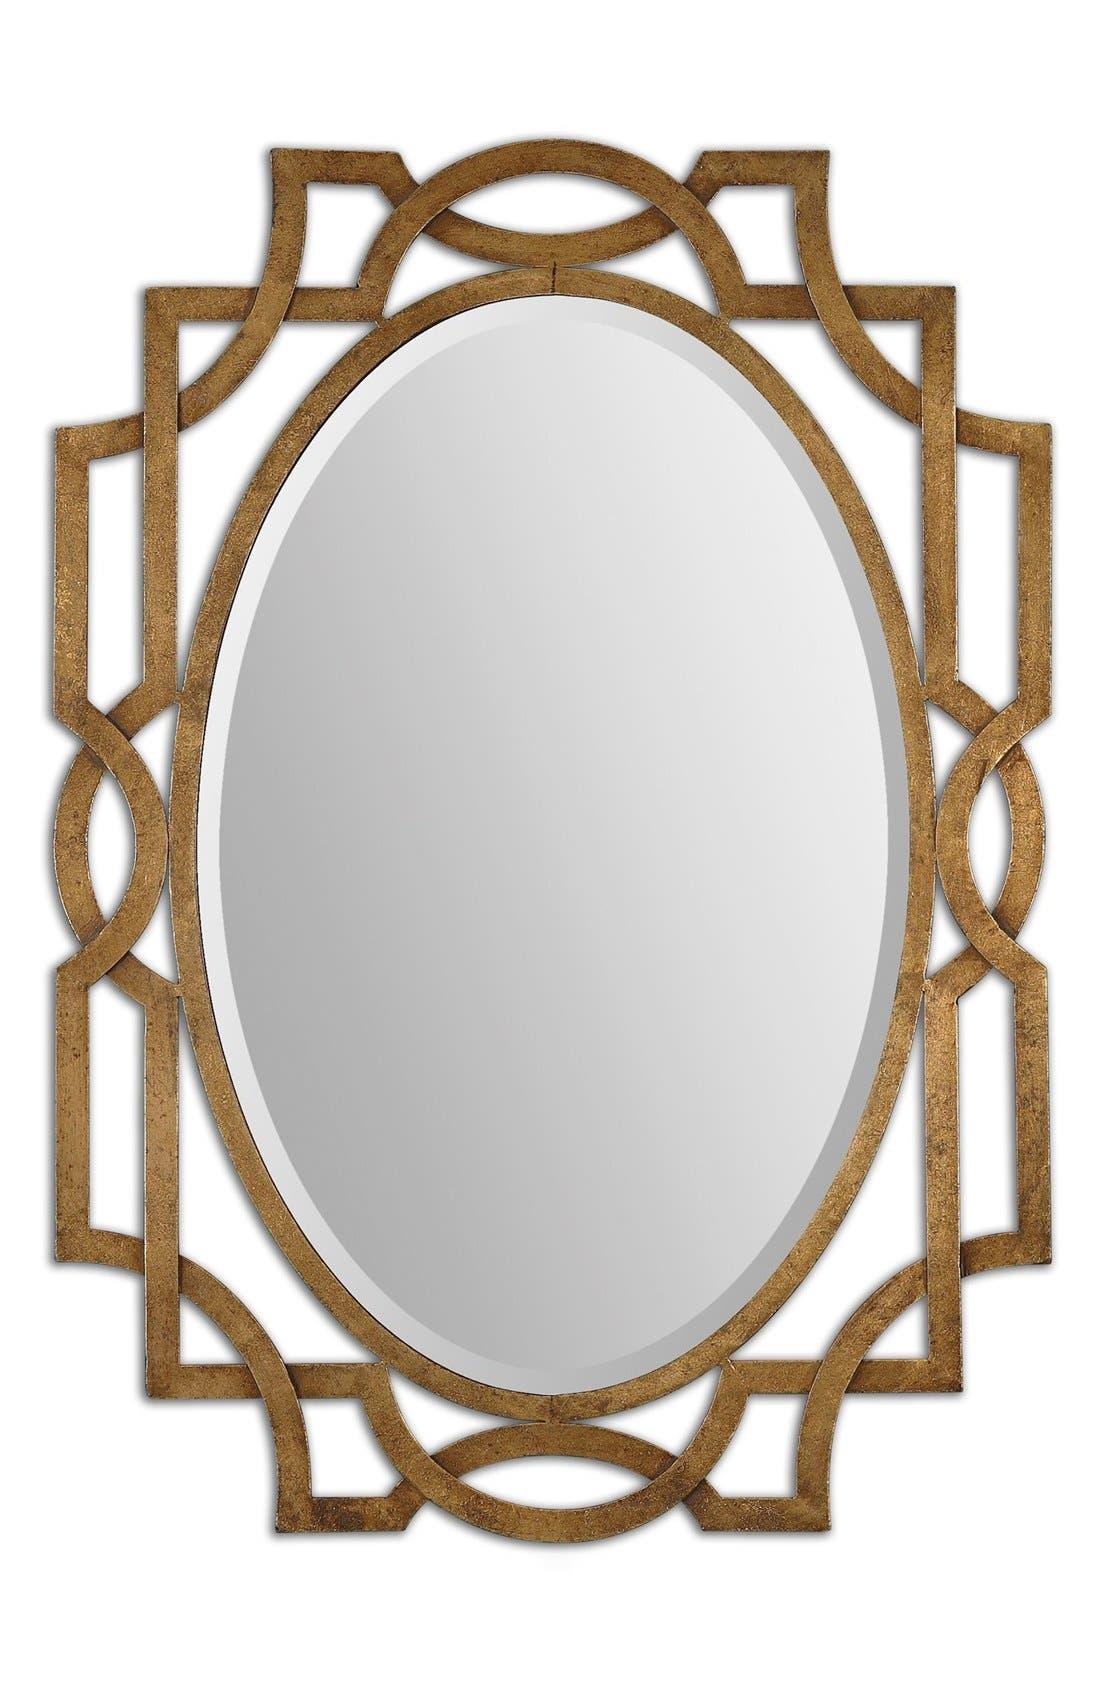 Alternate Image 1 Selected - Uttermost 'Margutta' Antiqued Goldtone Oval Mirror